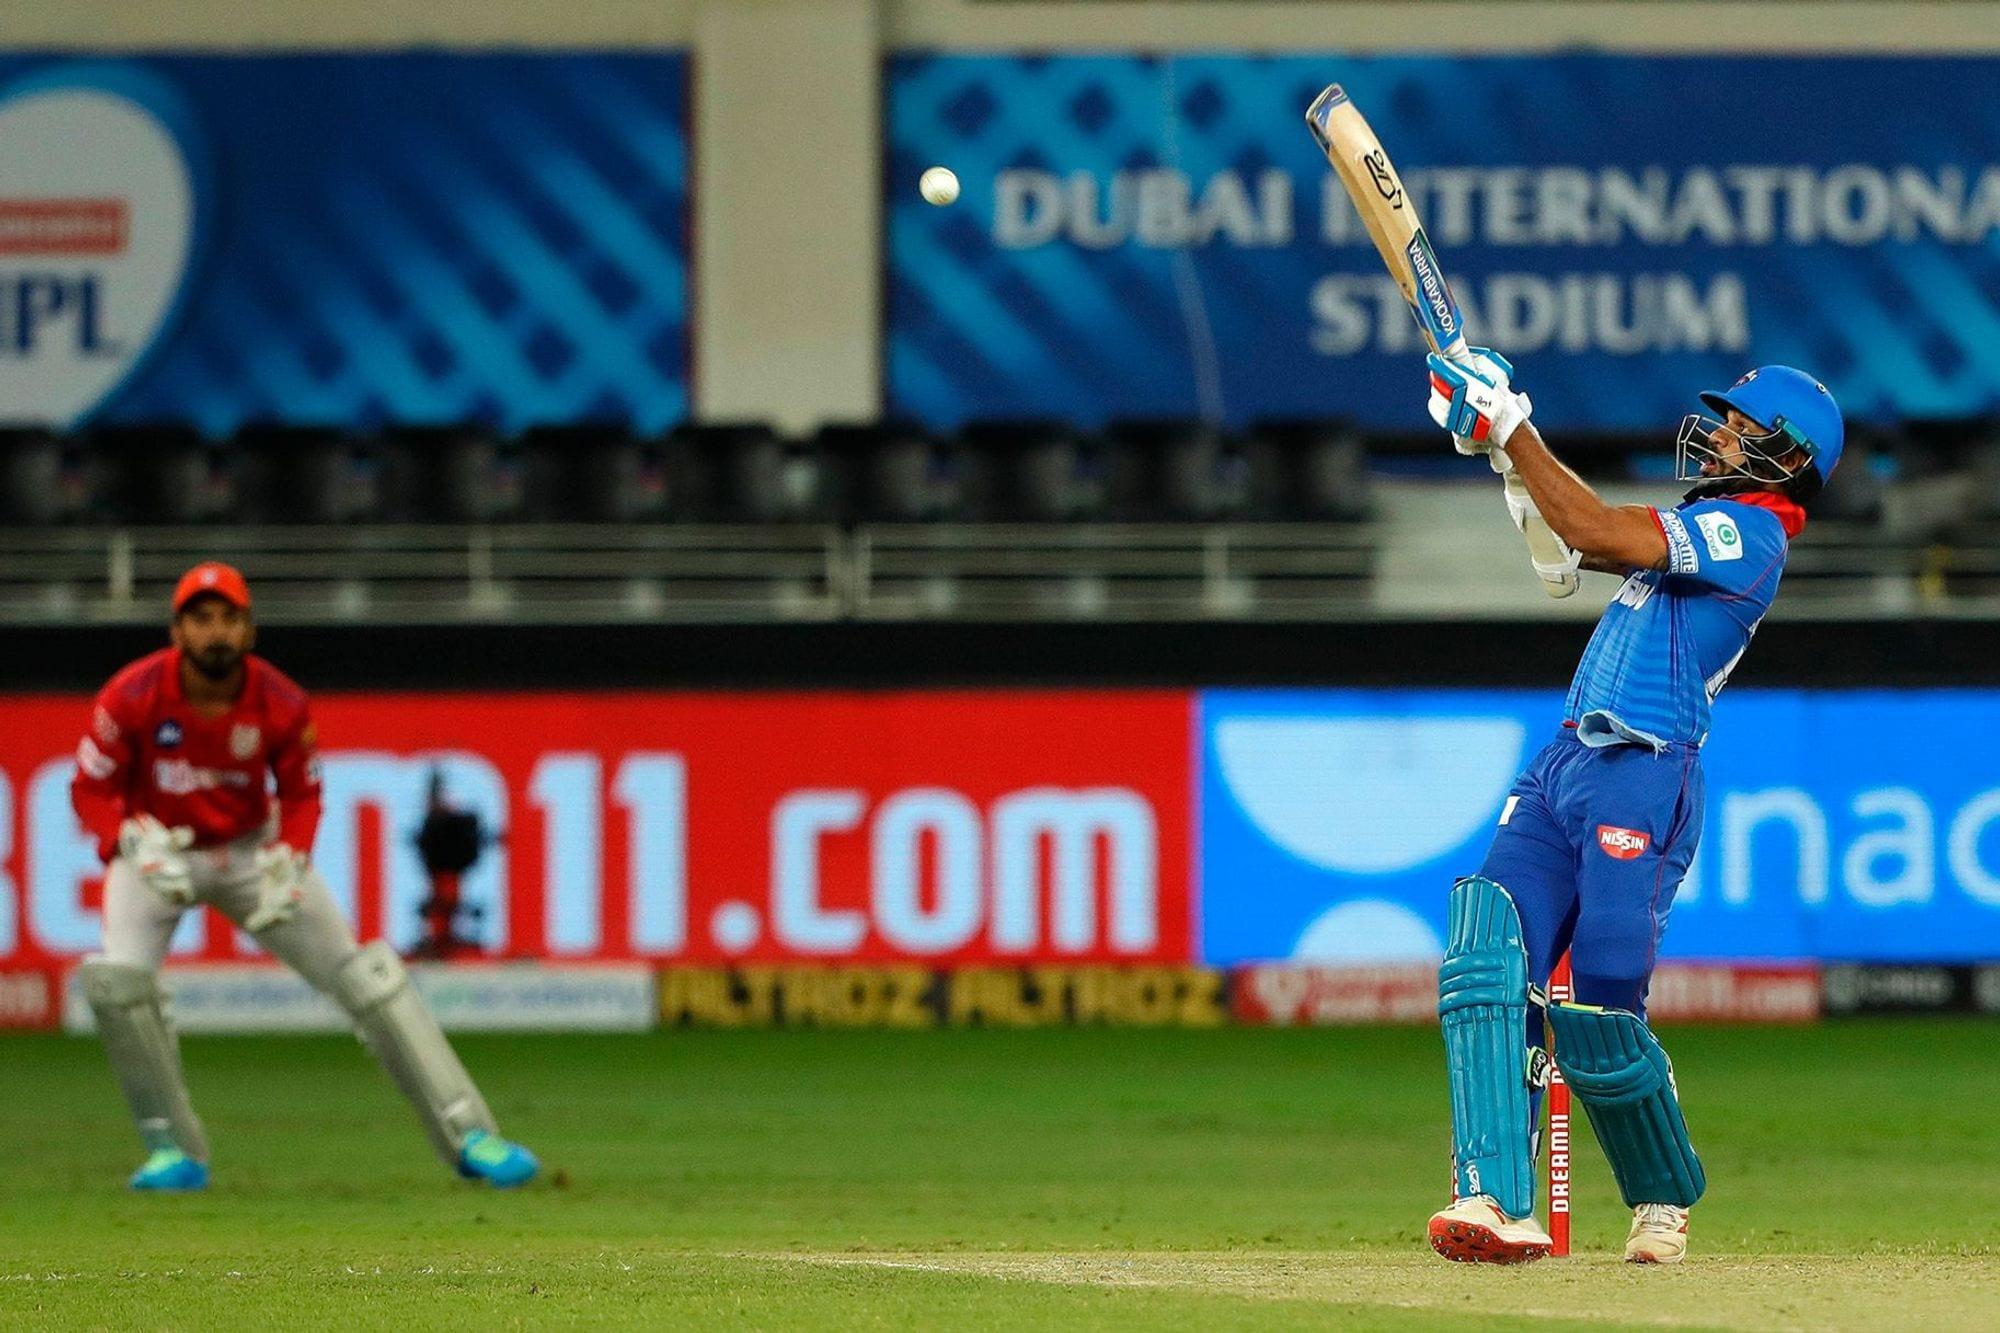 IPL 2020: In Pics, Kings XI Punjab vs Delhi Capitals, Match 38 in Dubai